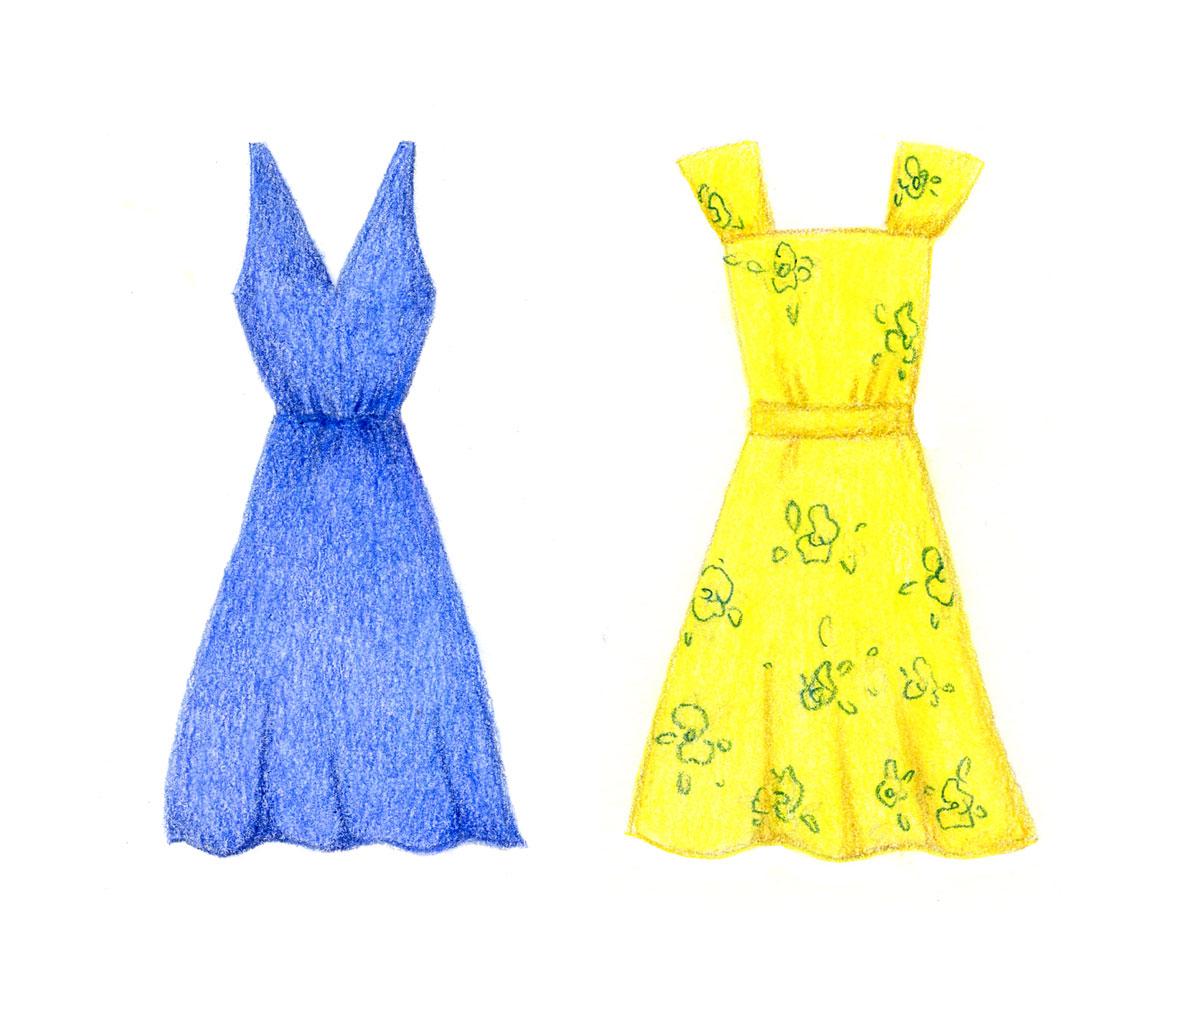 mias_dress.jpg